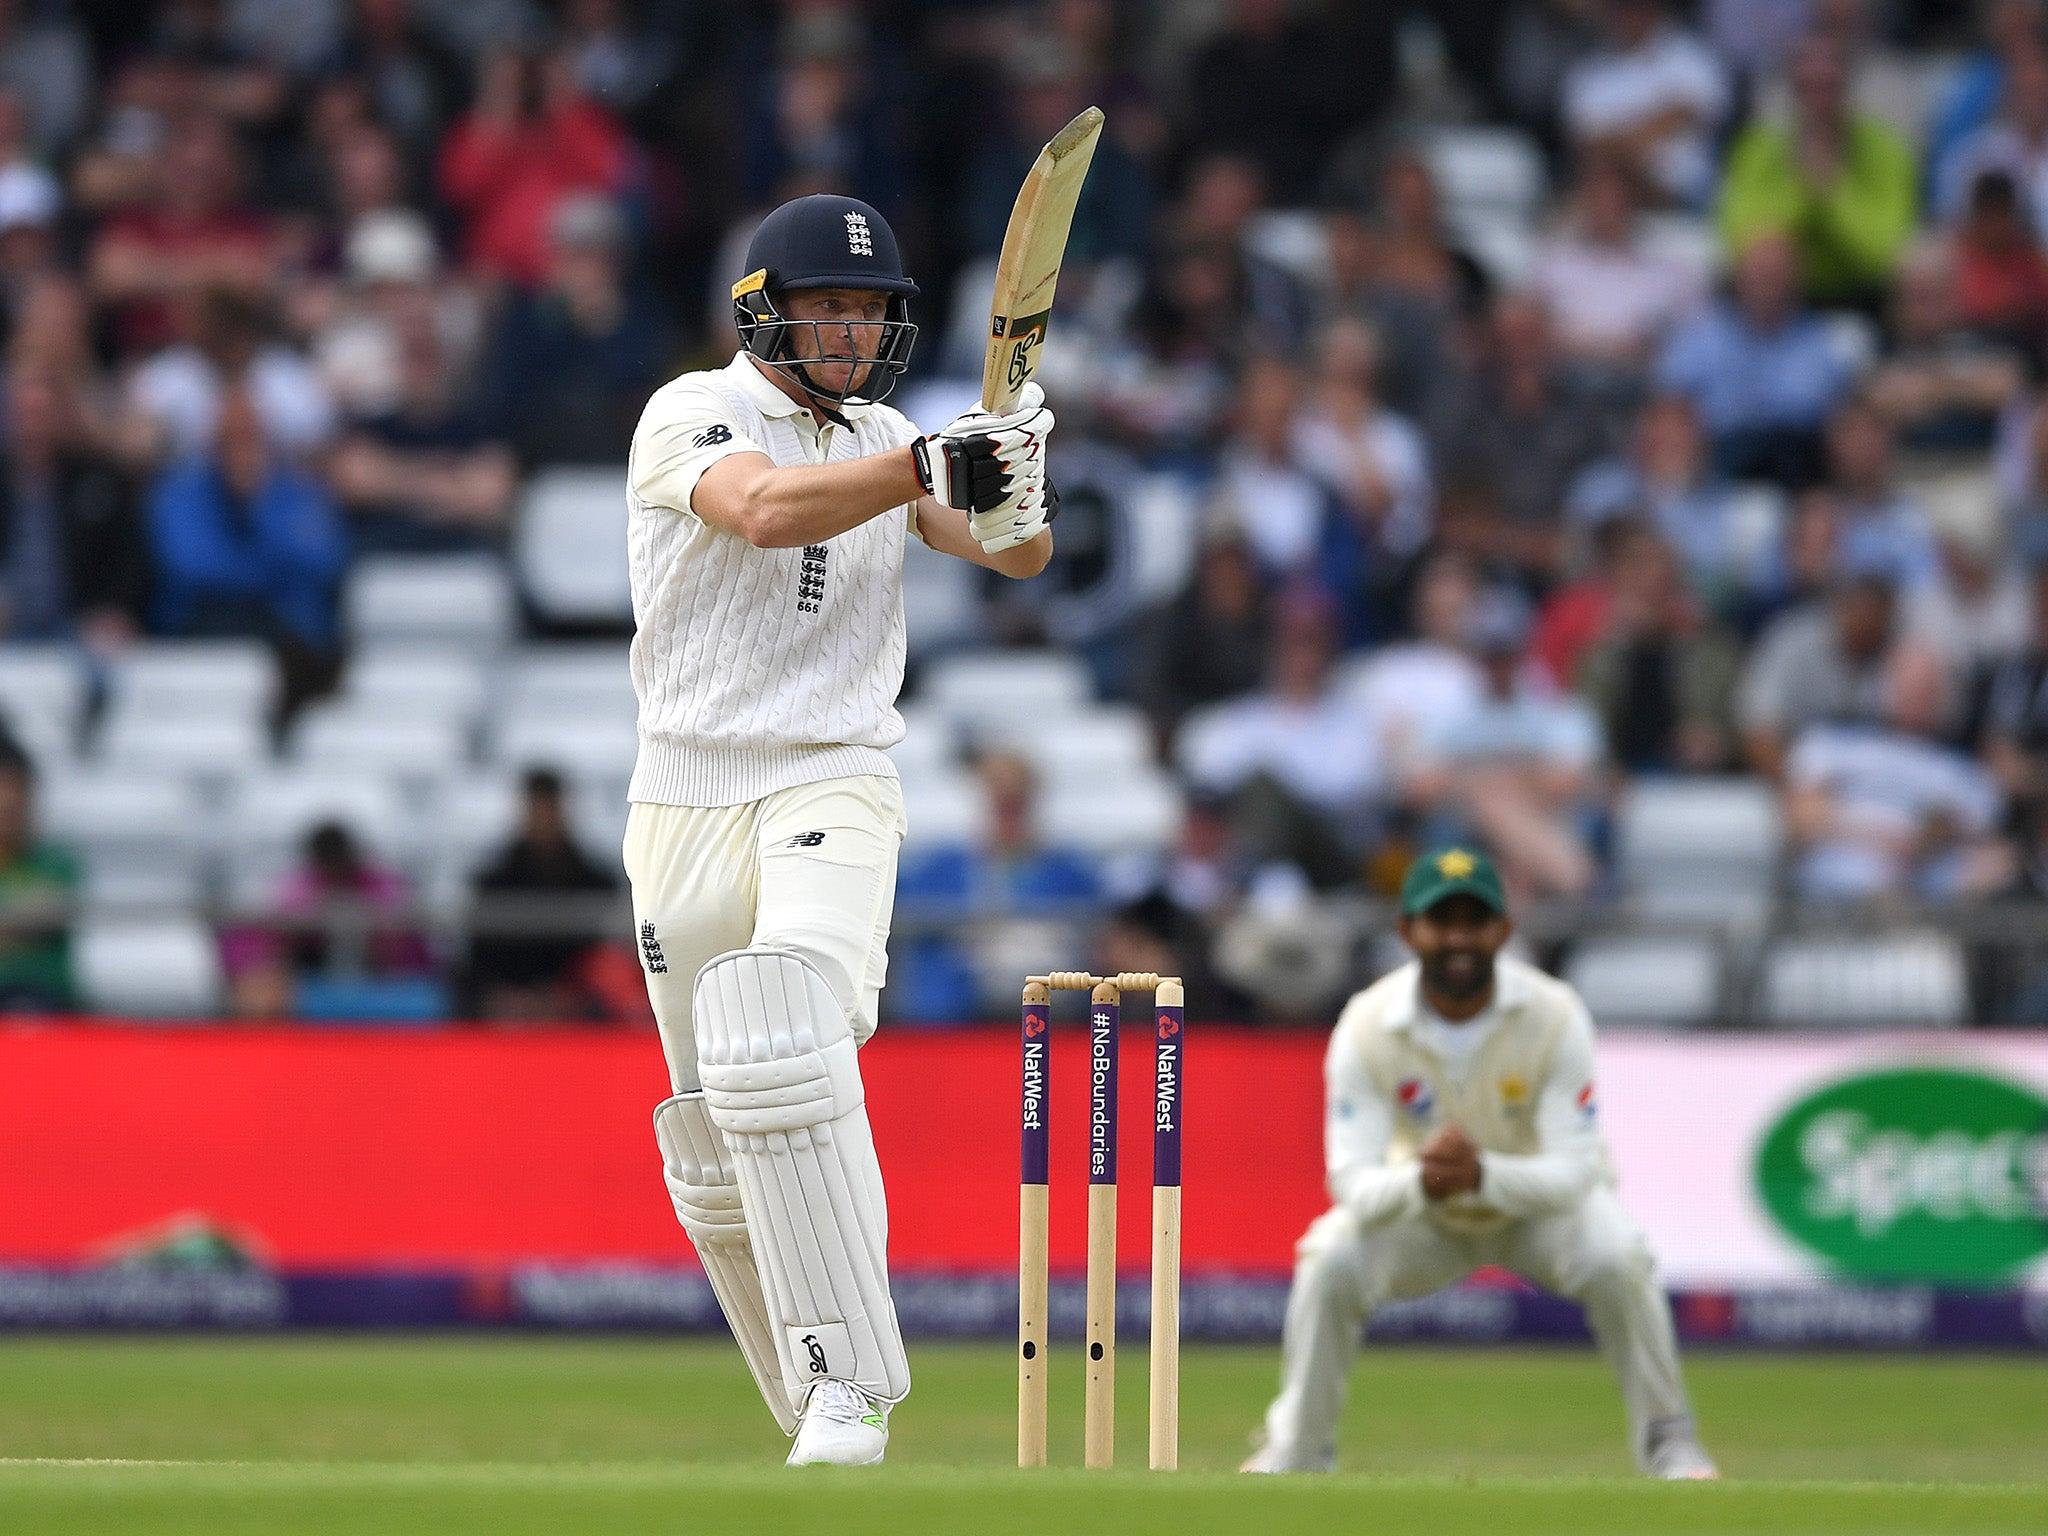 Jos Buttler's carefree mantra helping him bridge cricket's widening gap | The Independentindependent_brand_ident_LOGOUntitled